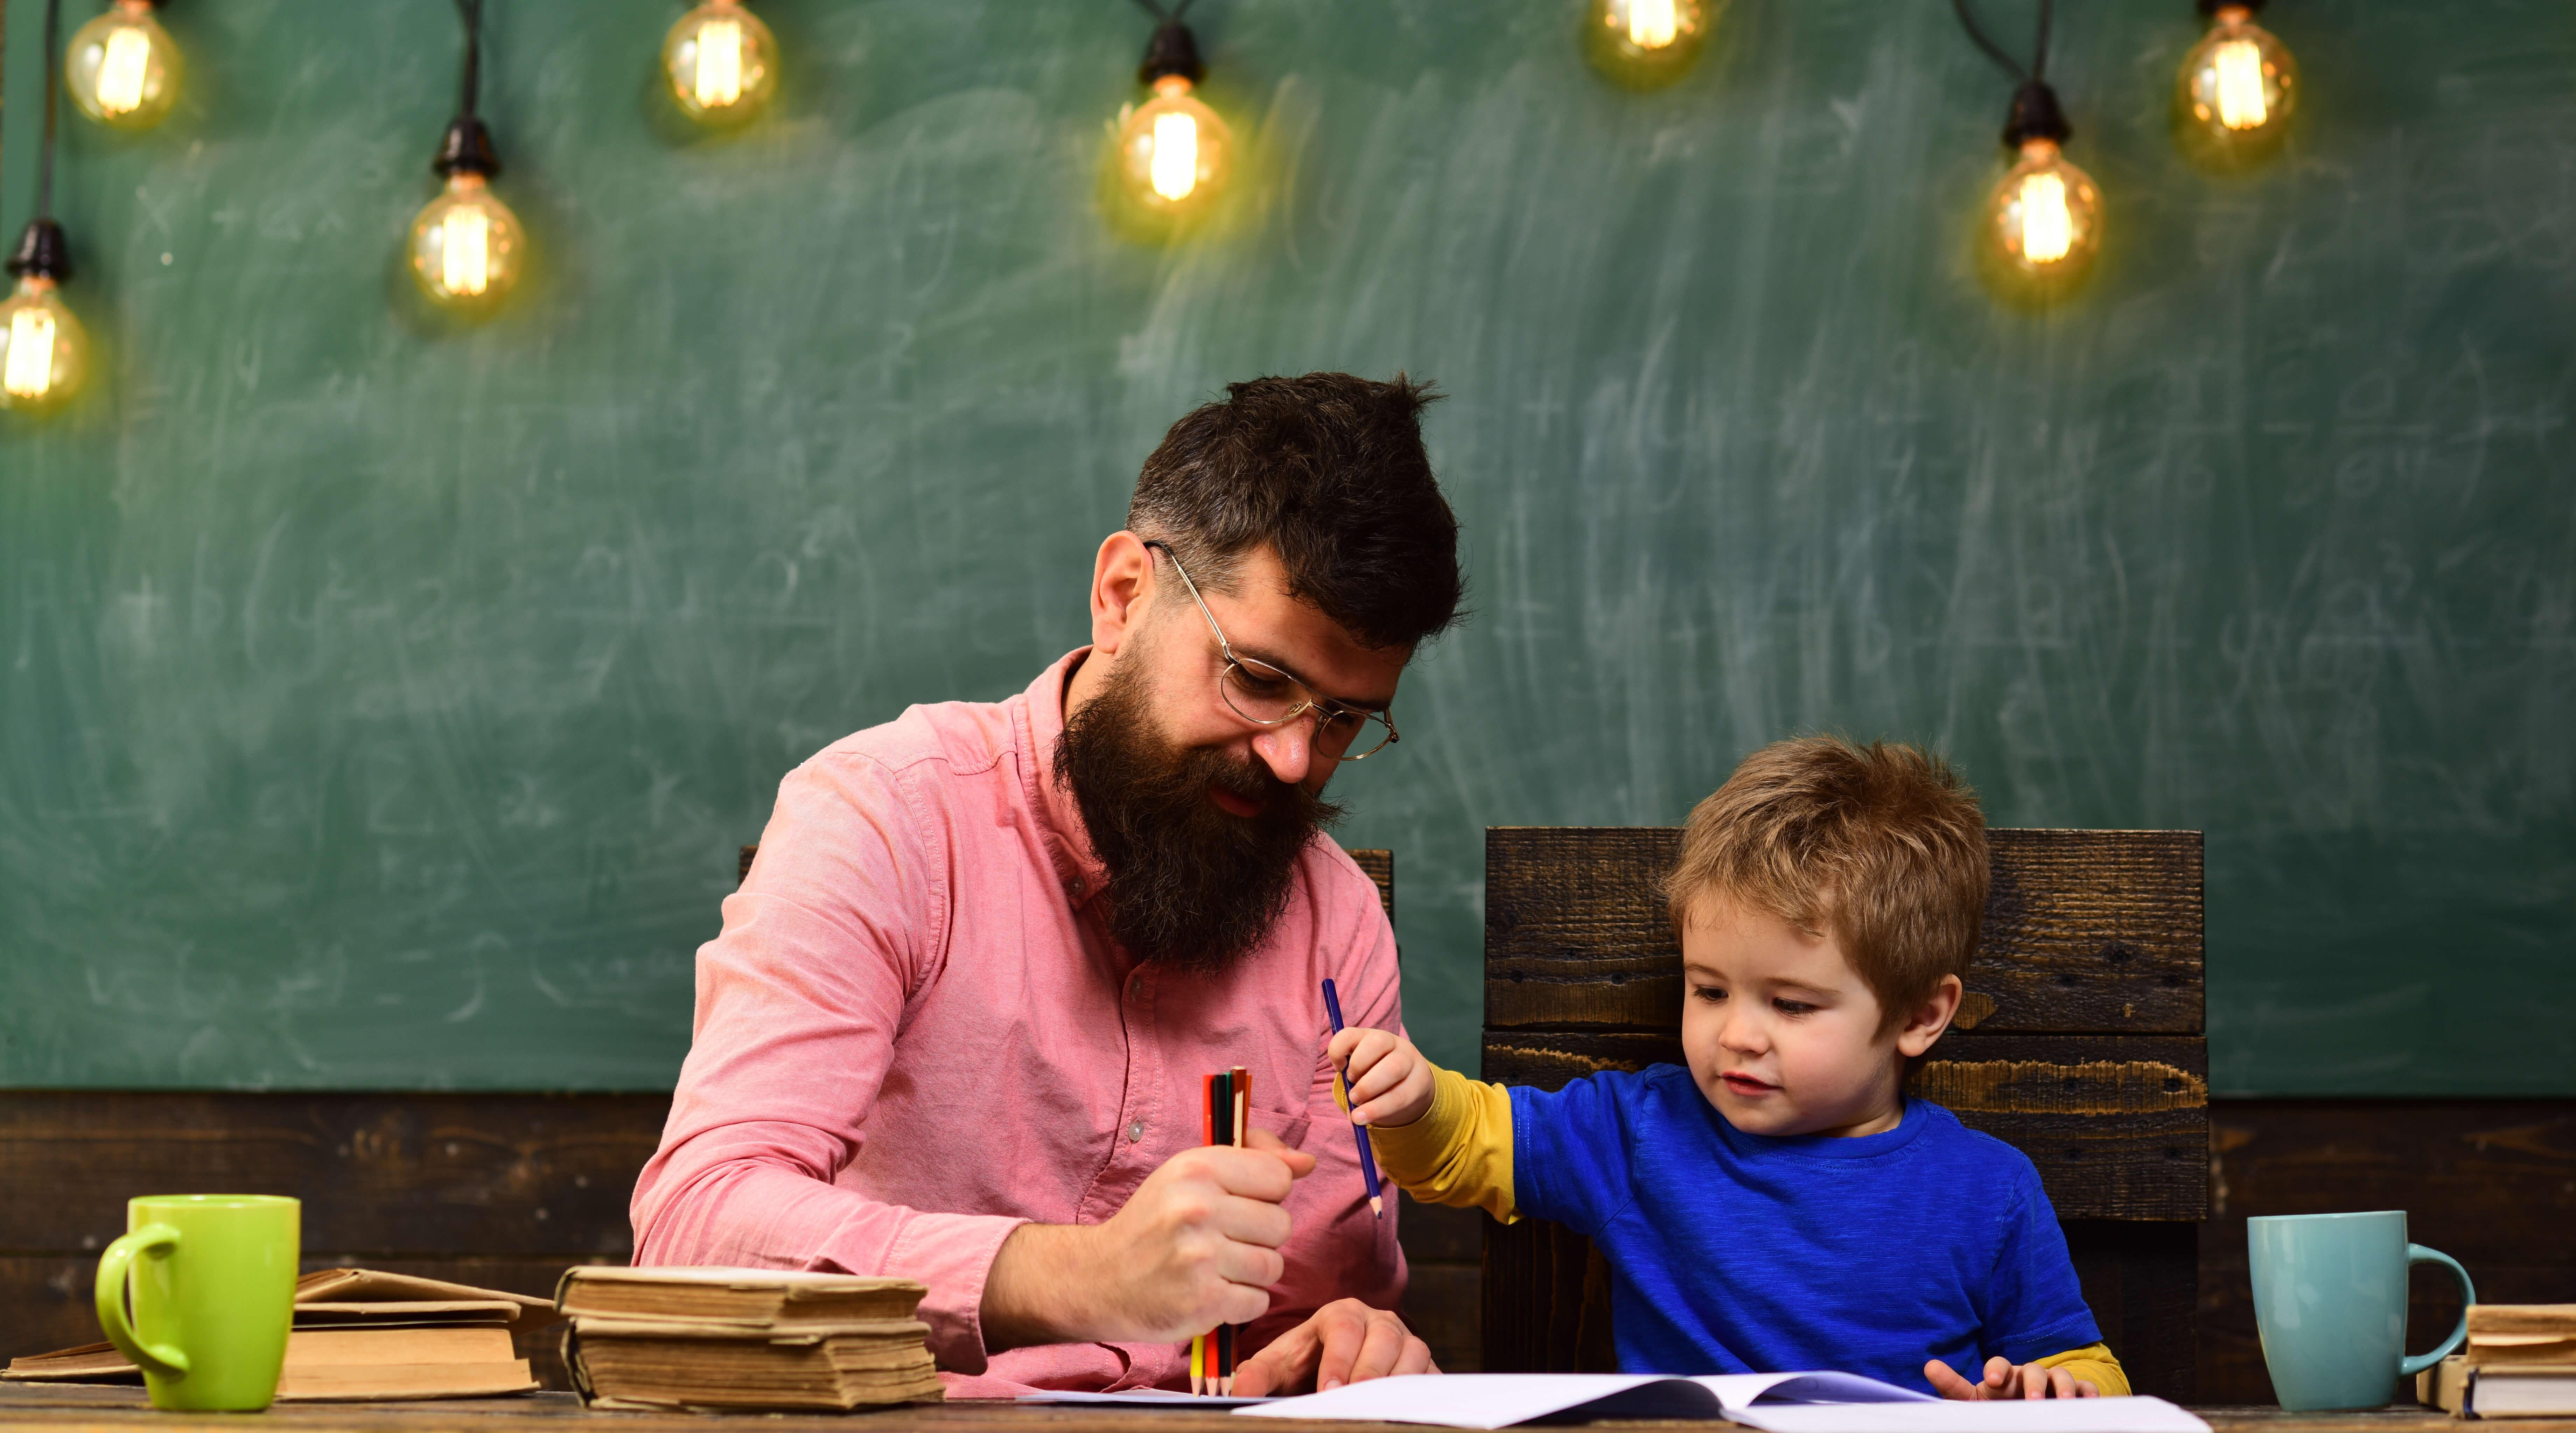 Studies Show Charter Schools Receive Less Money Than Public Schools